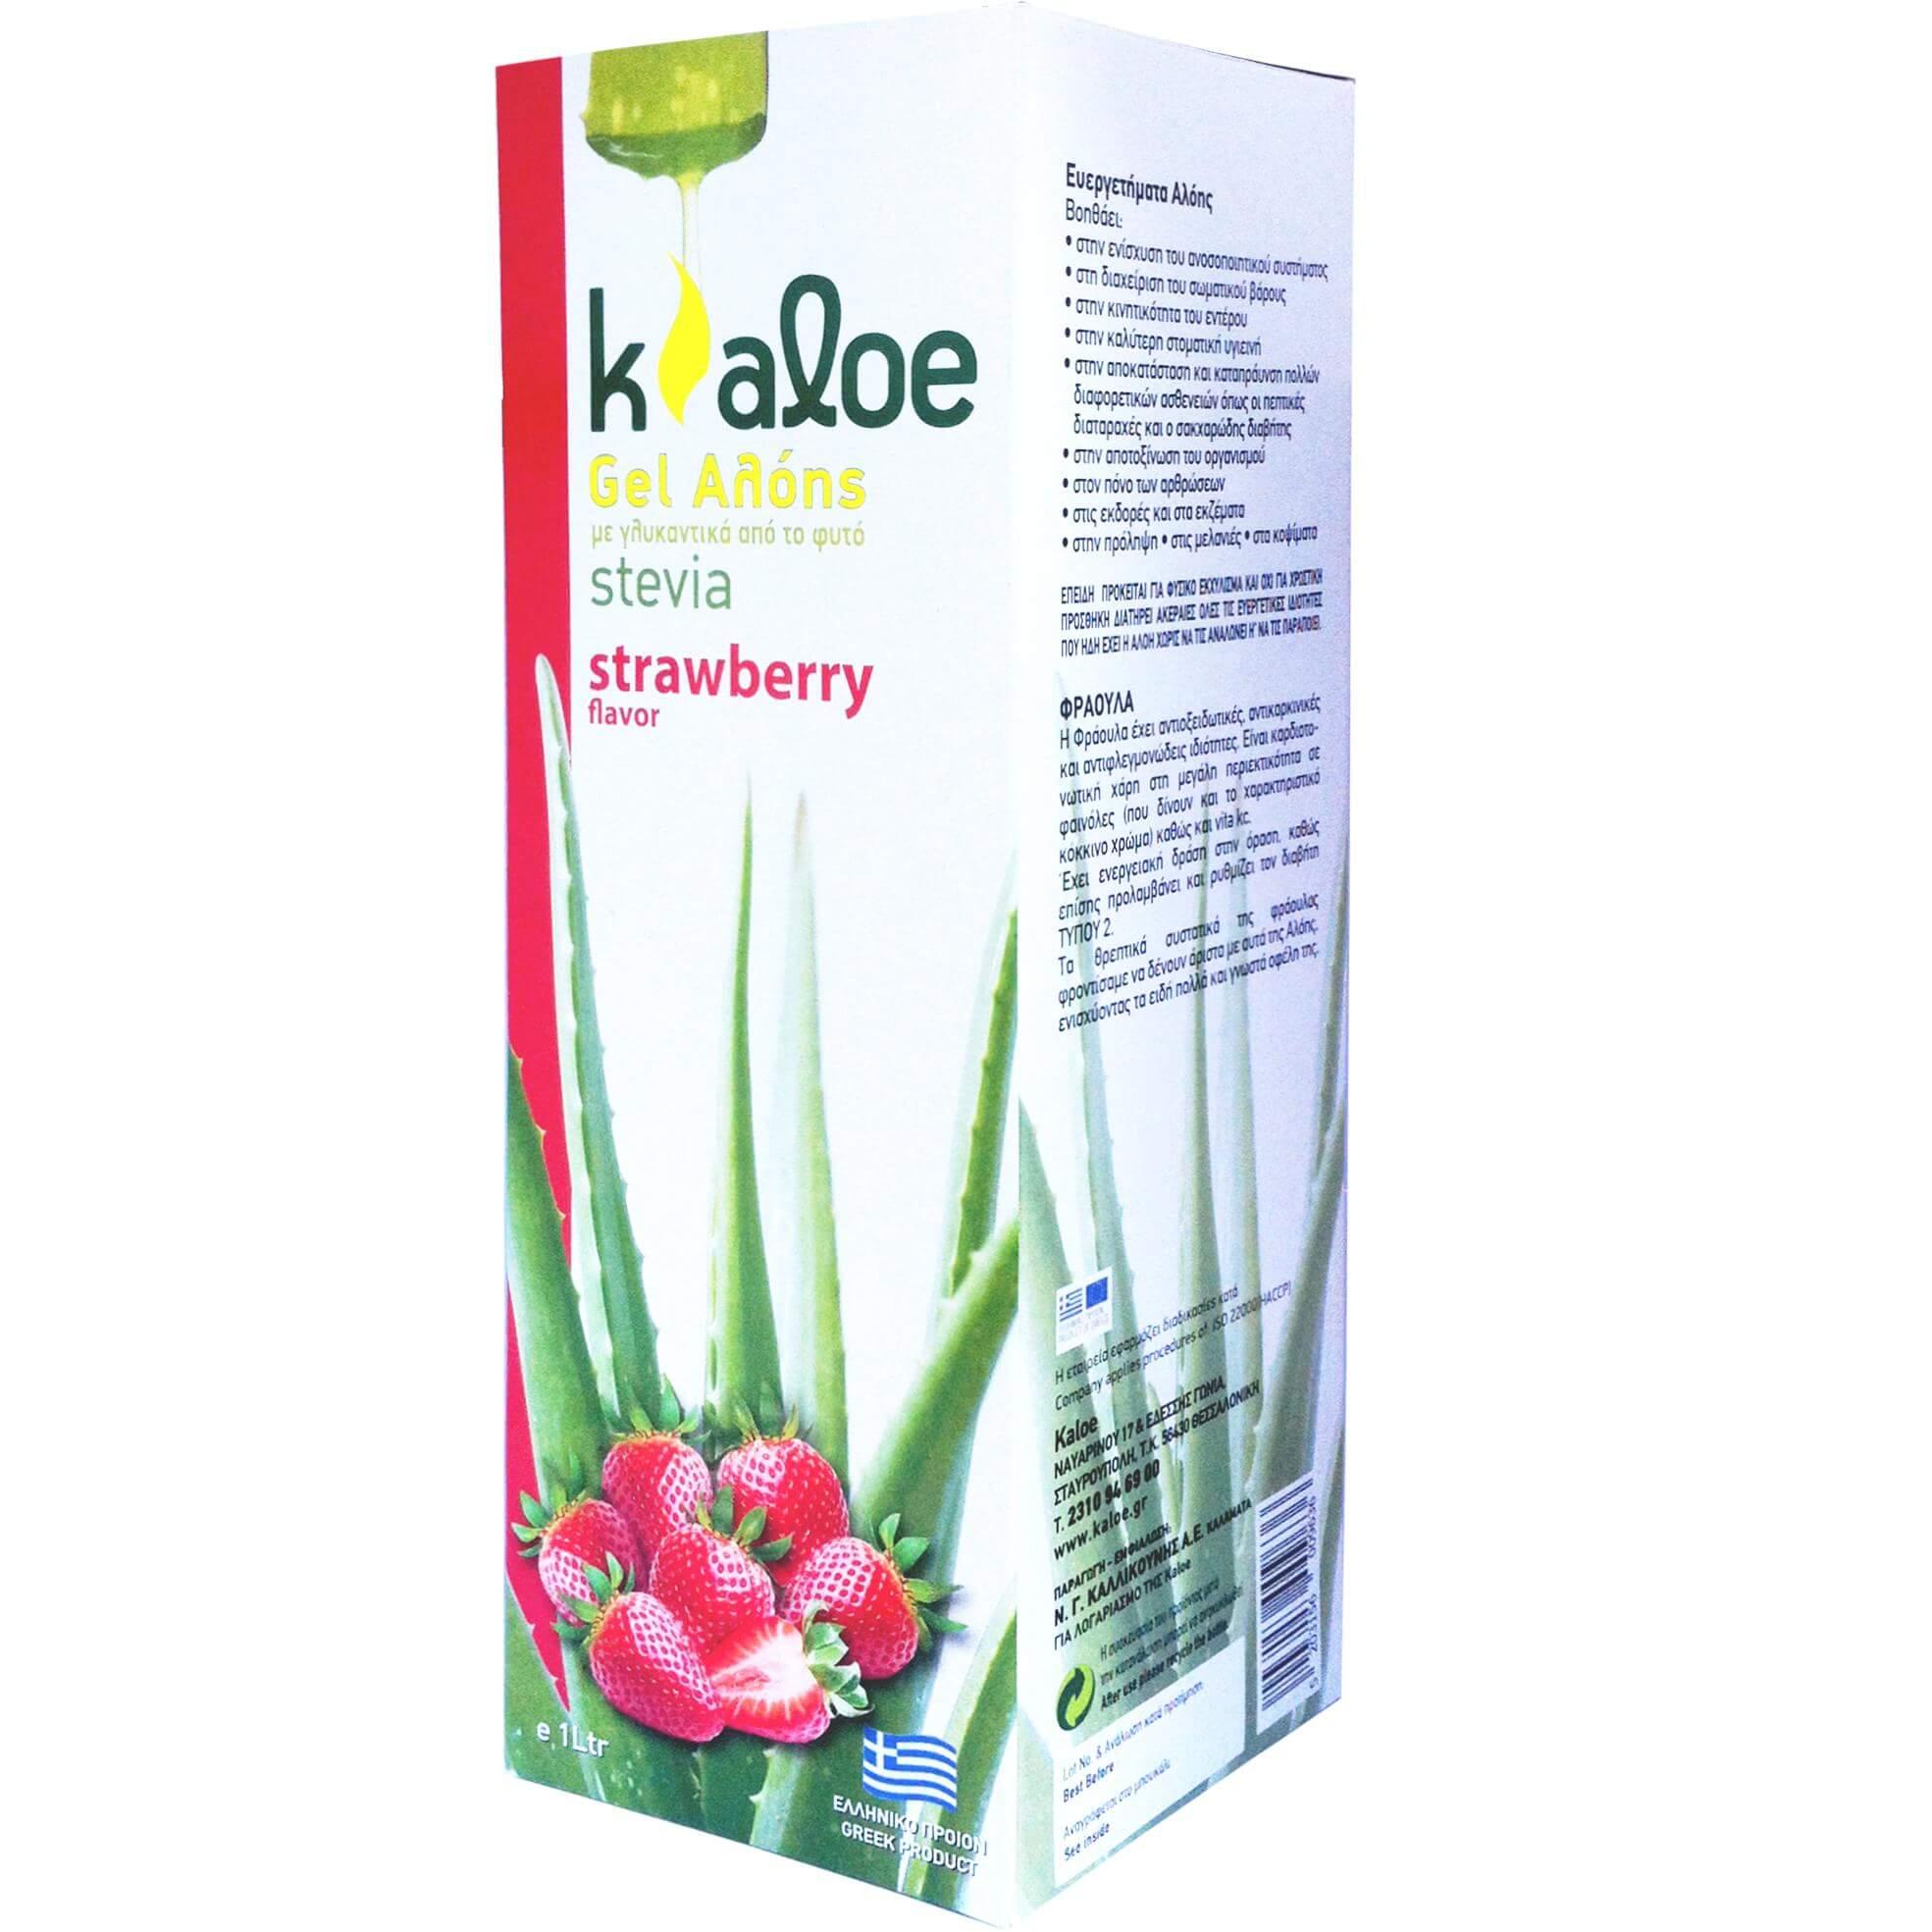 Kaloe Gel Αλόης Φυσικός Χυμός Βιολογικής Αλόης με Γεύση Φράουλα & Γλυκαντικά Από το Φυτό Stevia 1Lt